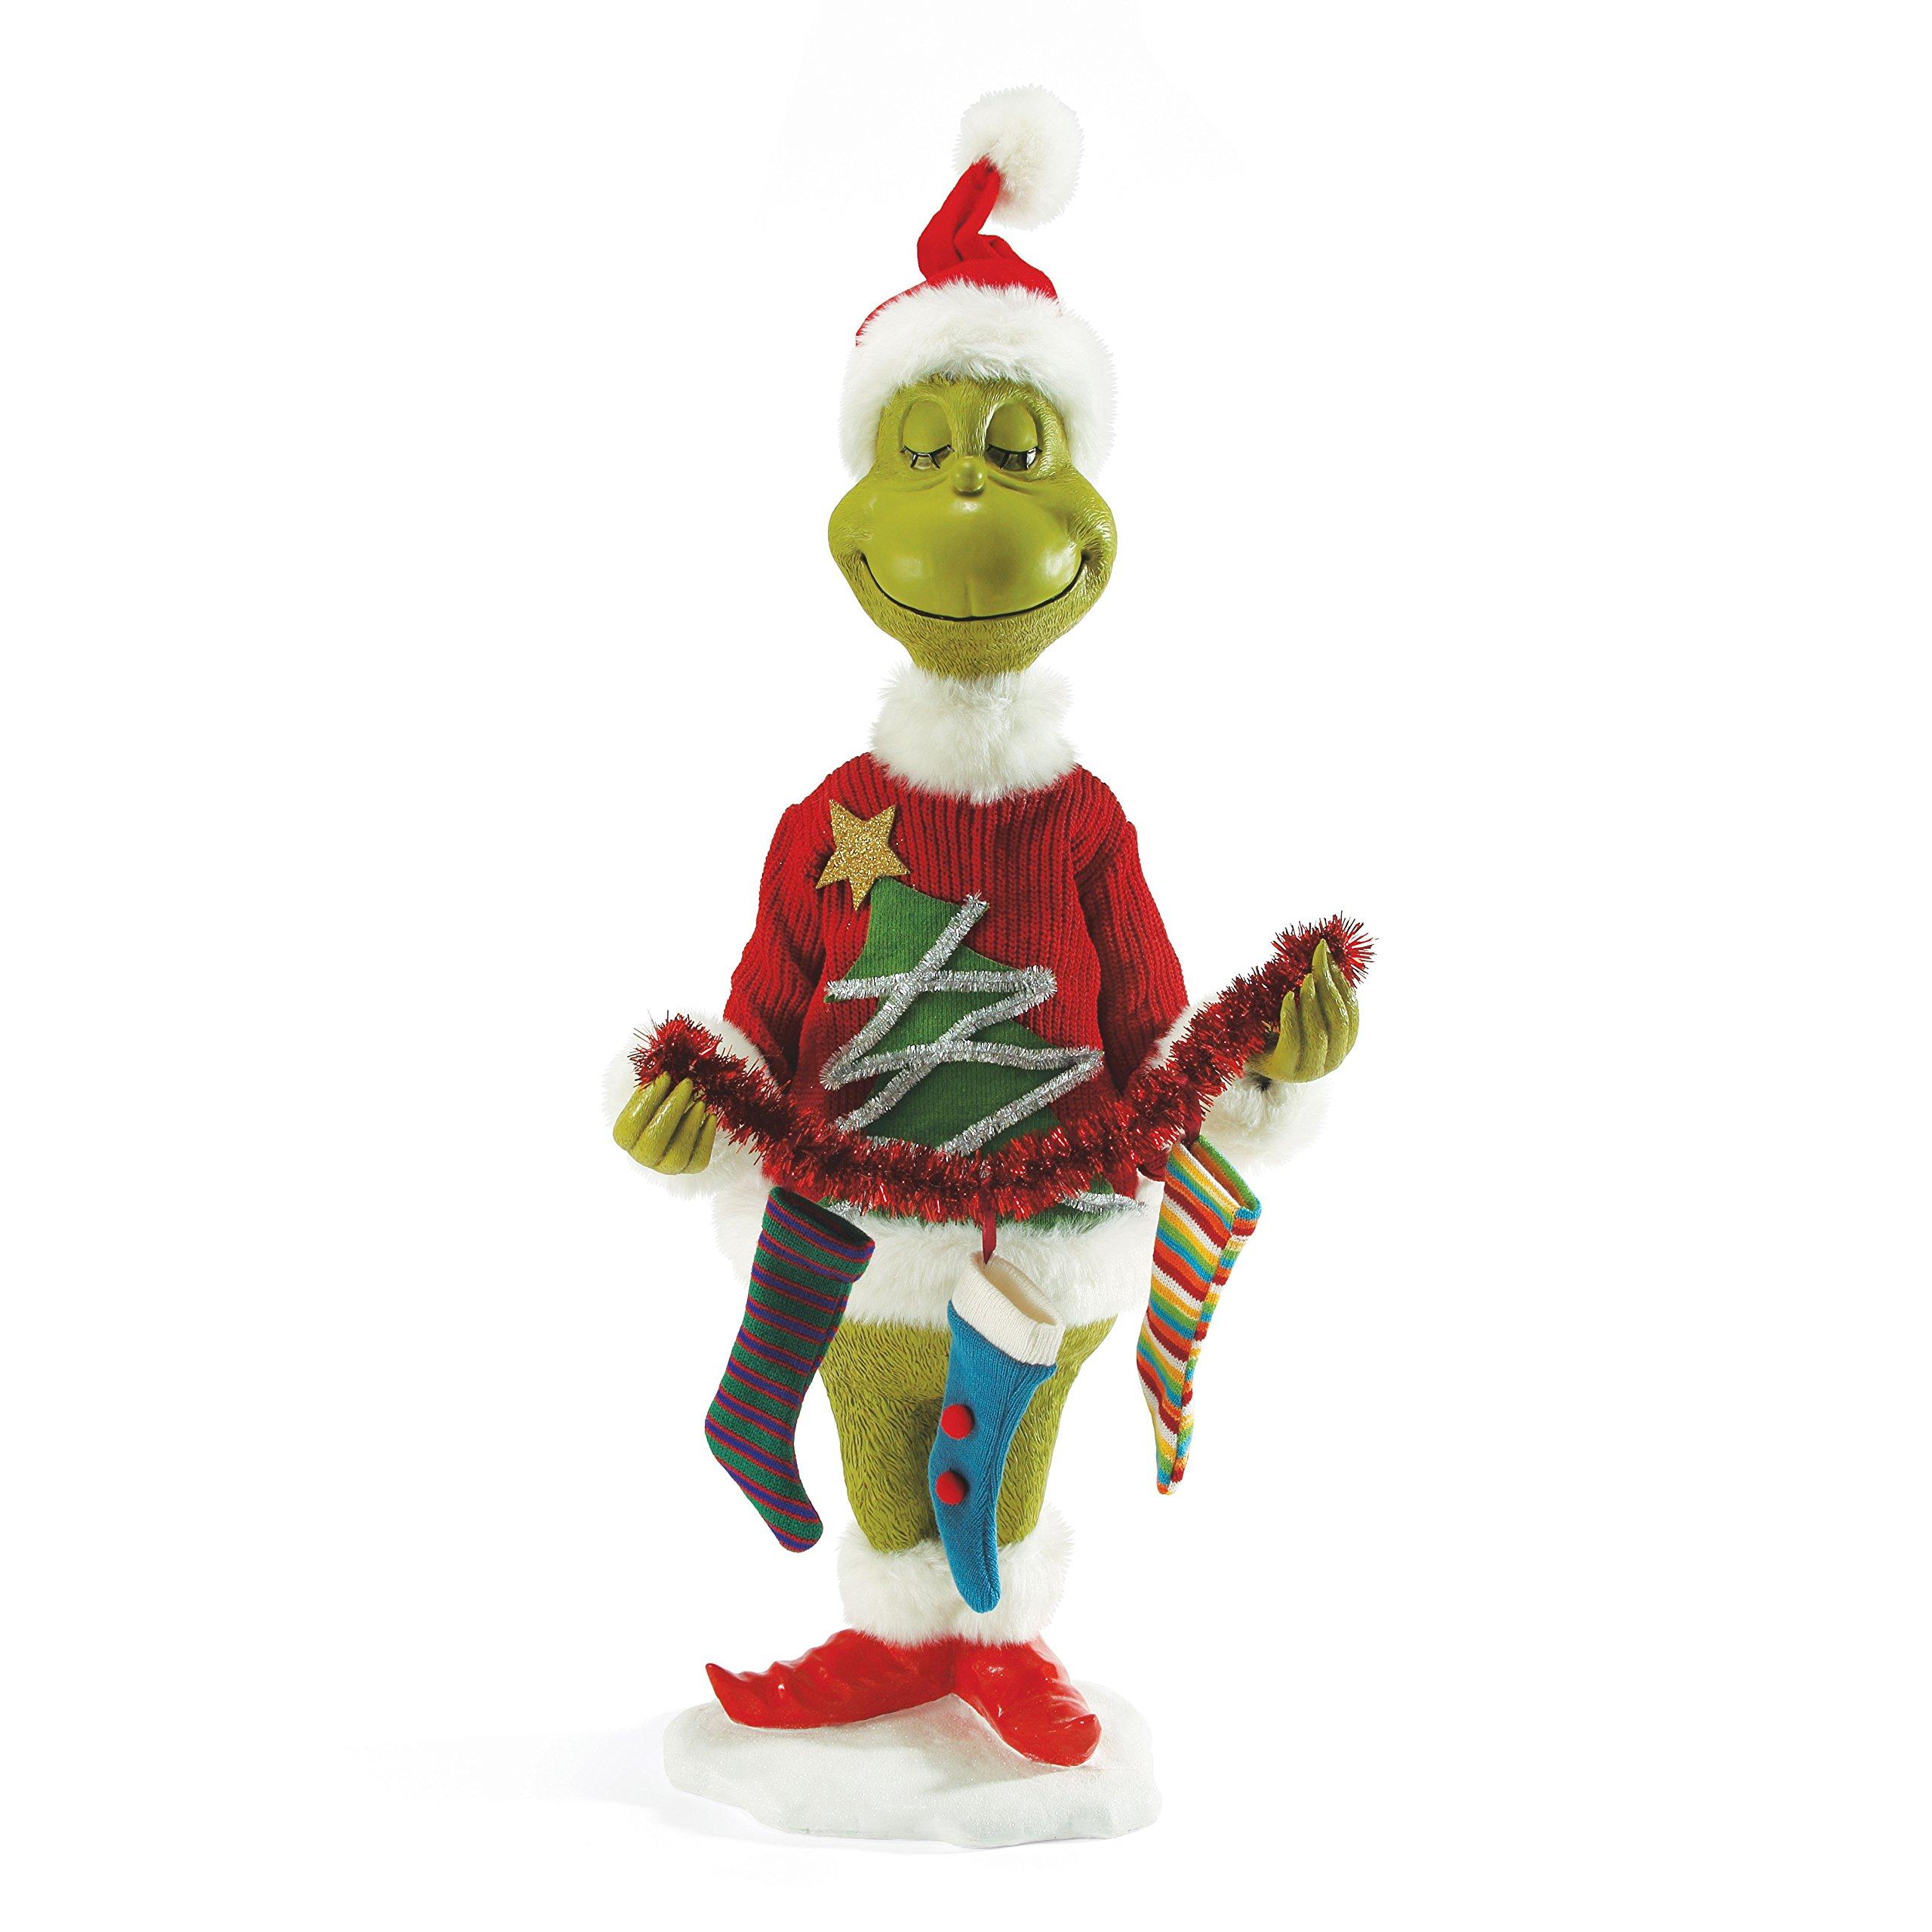 Department 56 Classics Mr. Grinch Figurine